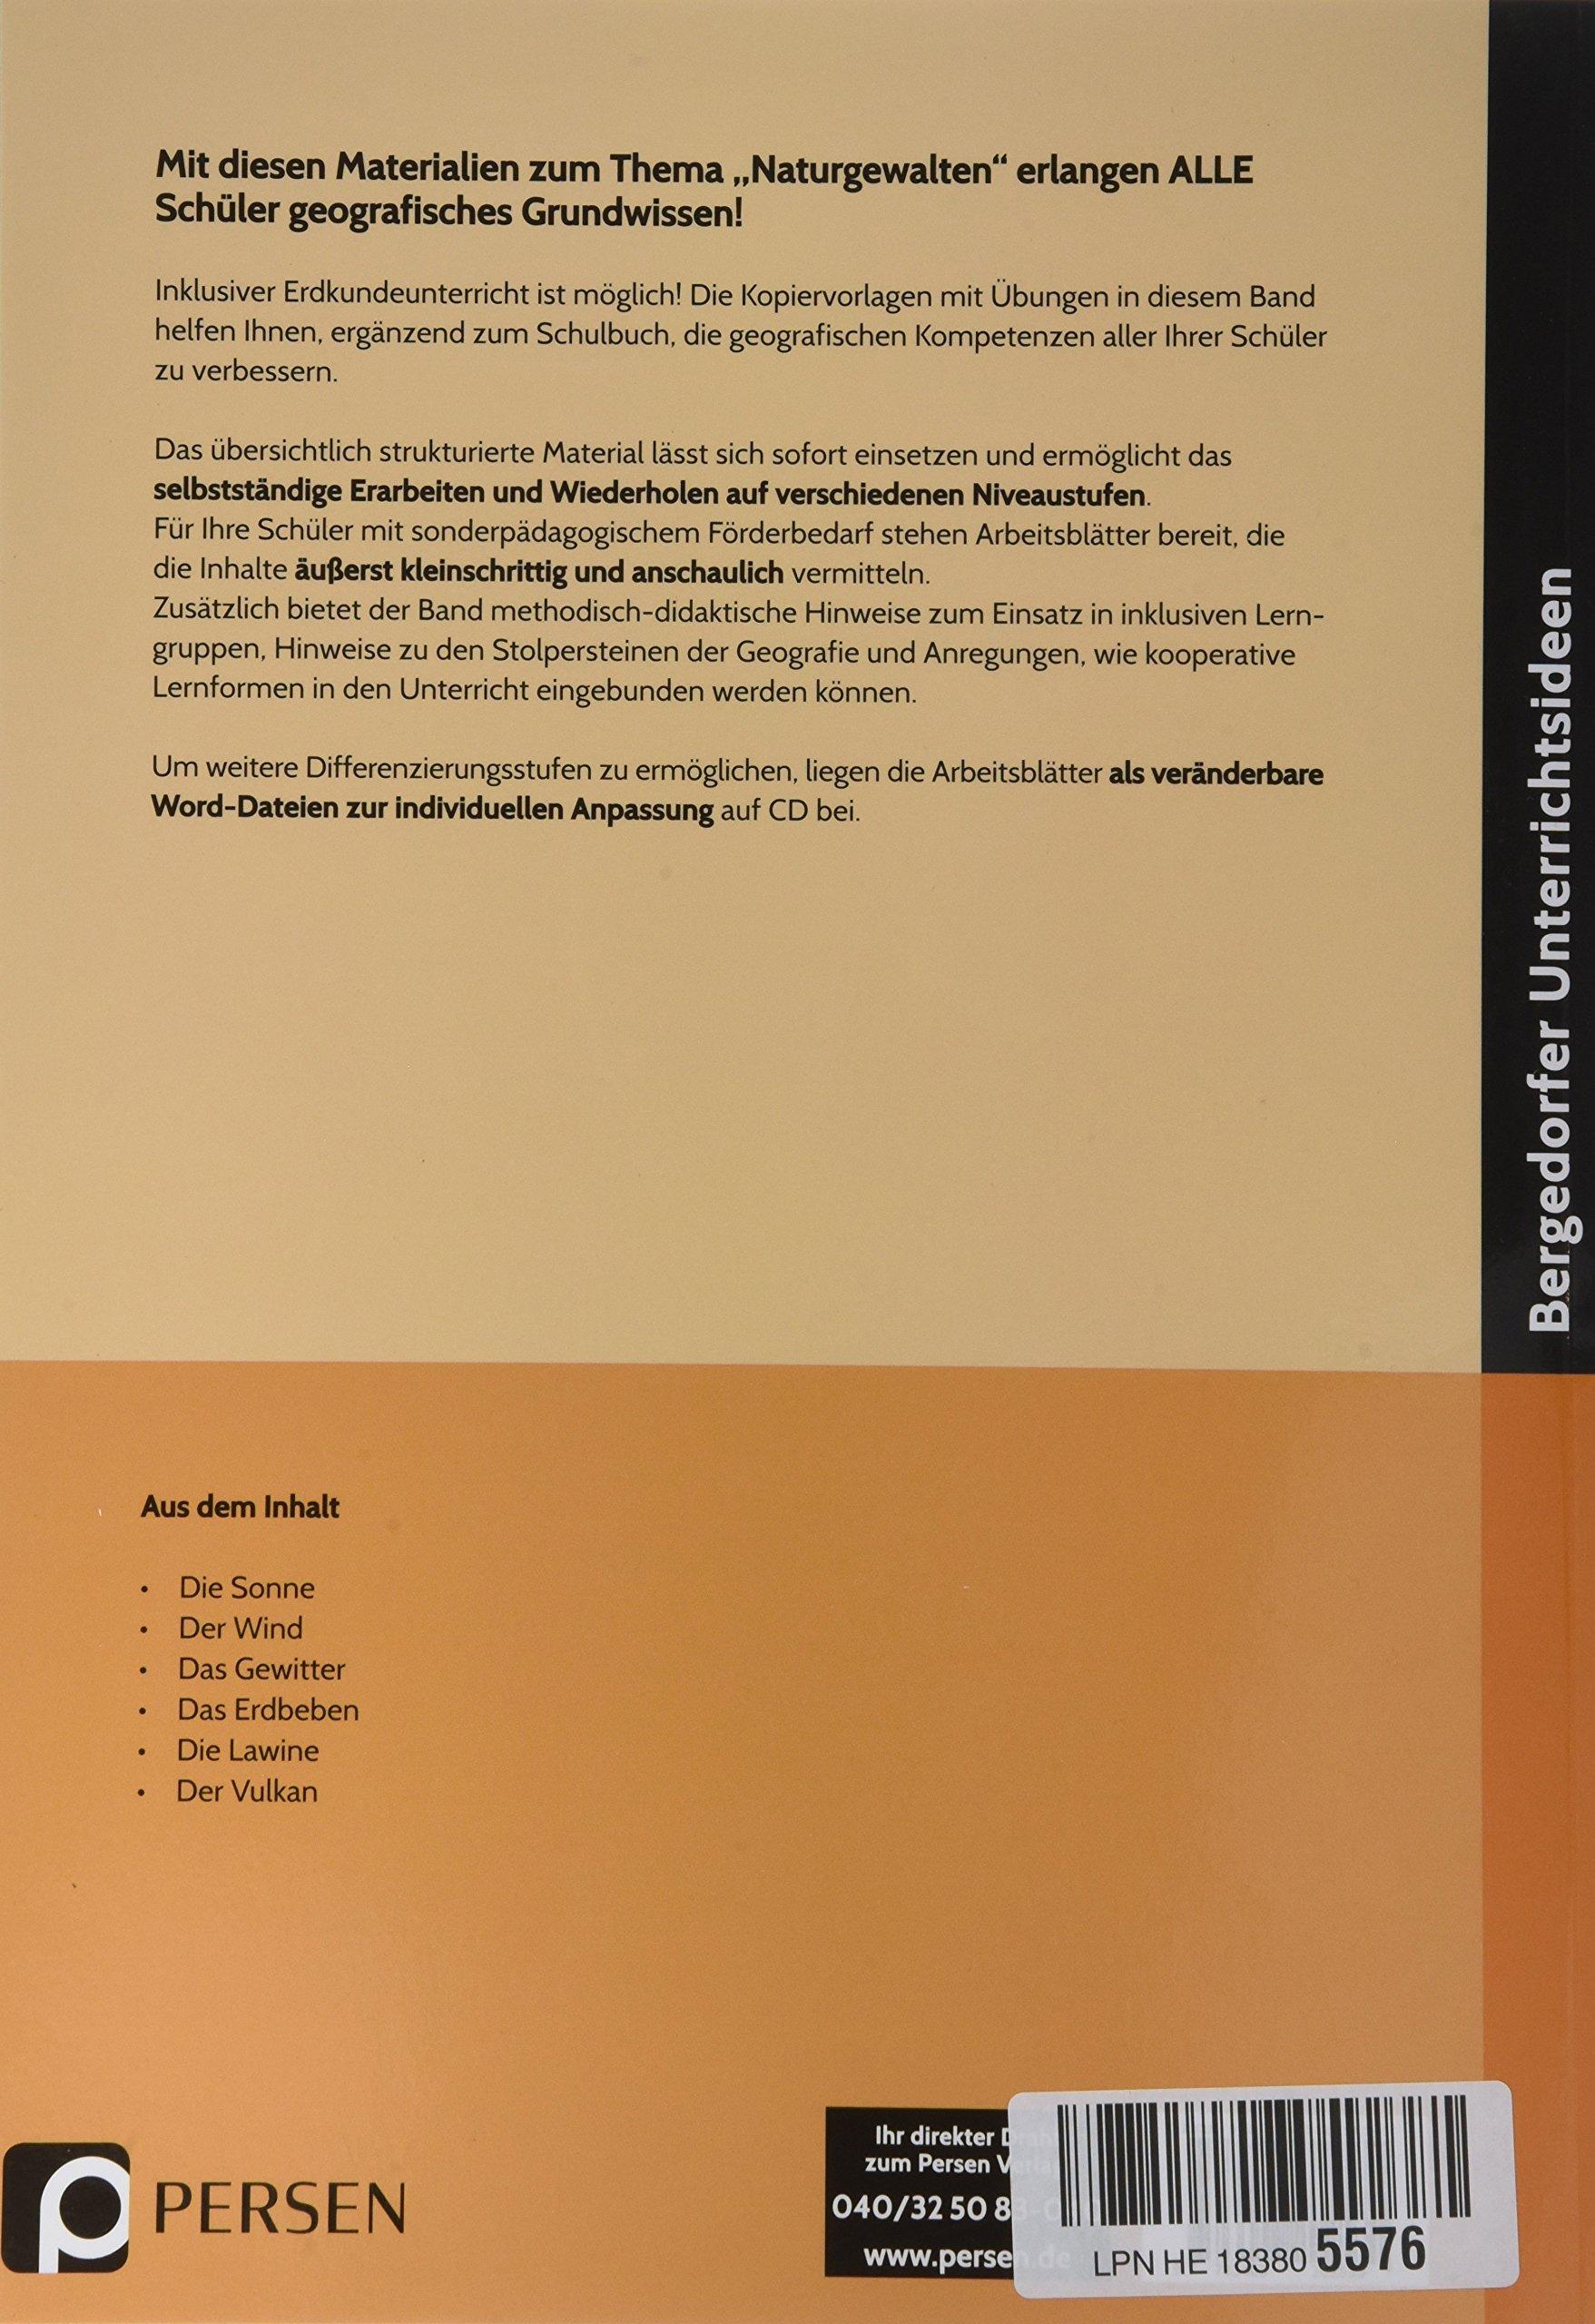 Naturgewalten - Inklusionsmaterial: 9783403202530: Amazon.com: Books